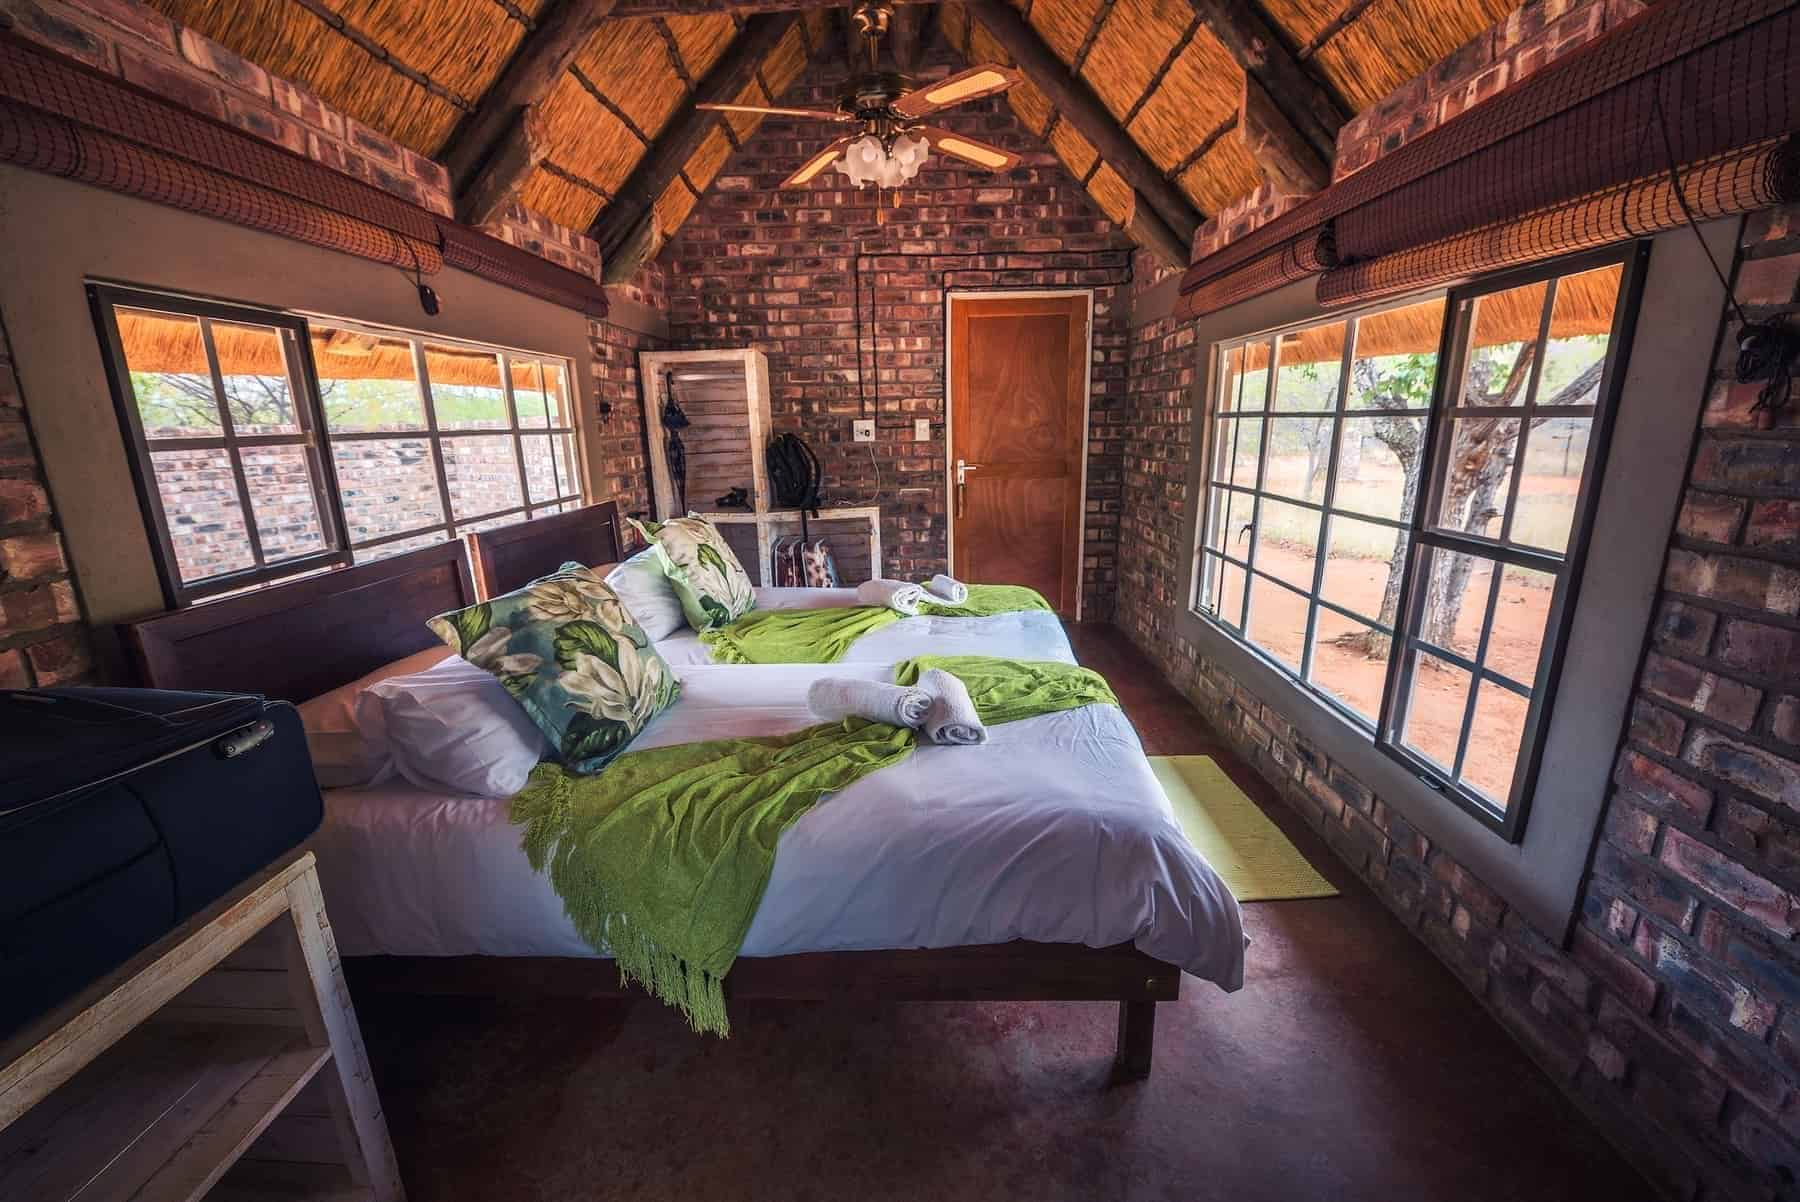 Kamanjab, Namibia - March 30, 2019 : Chalet interior of the Kaoko Bush Lodge in Kamanjab. This desert lodge is located near the Galton Gate of Etosha National Park.